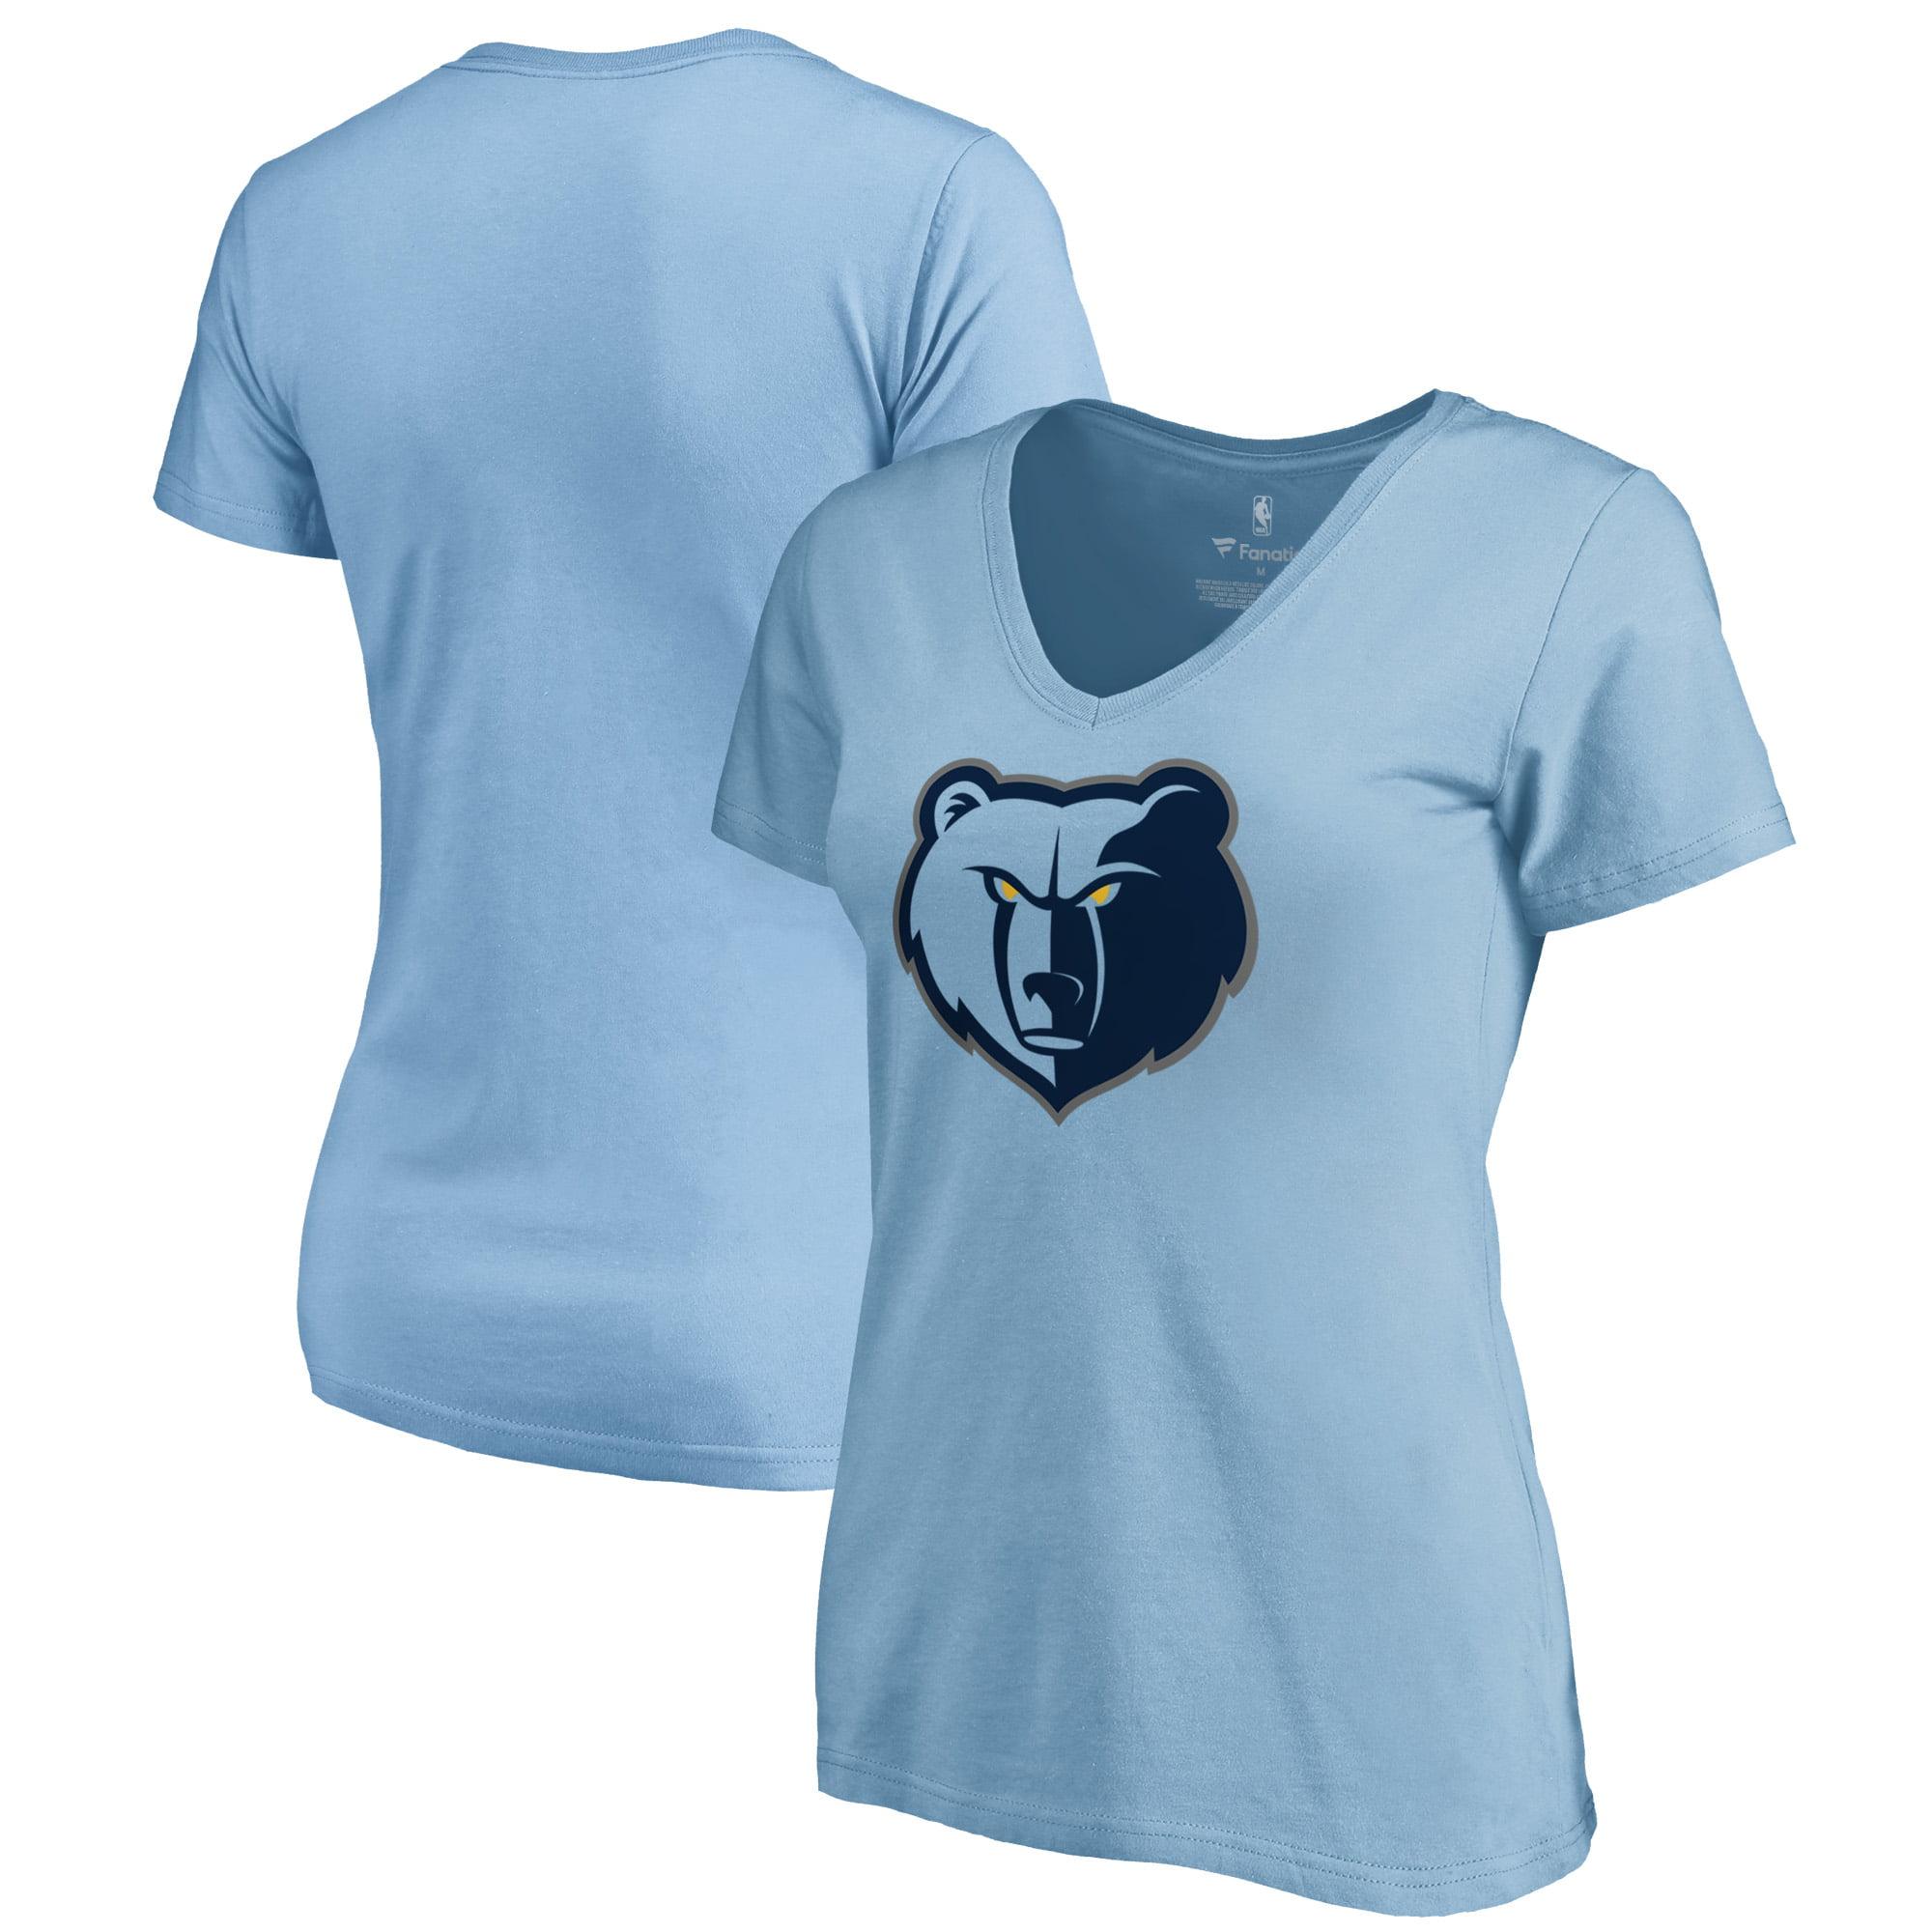 Memphis Grizzlies Fanatics Branded Women's Primary Logo V-Neck T-Shirt - Light Blue